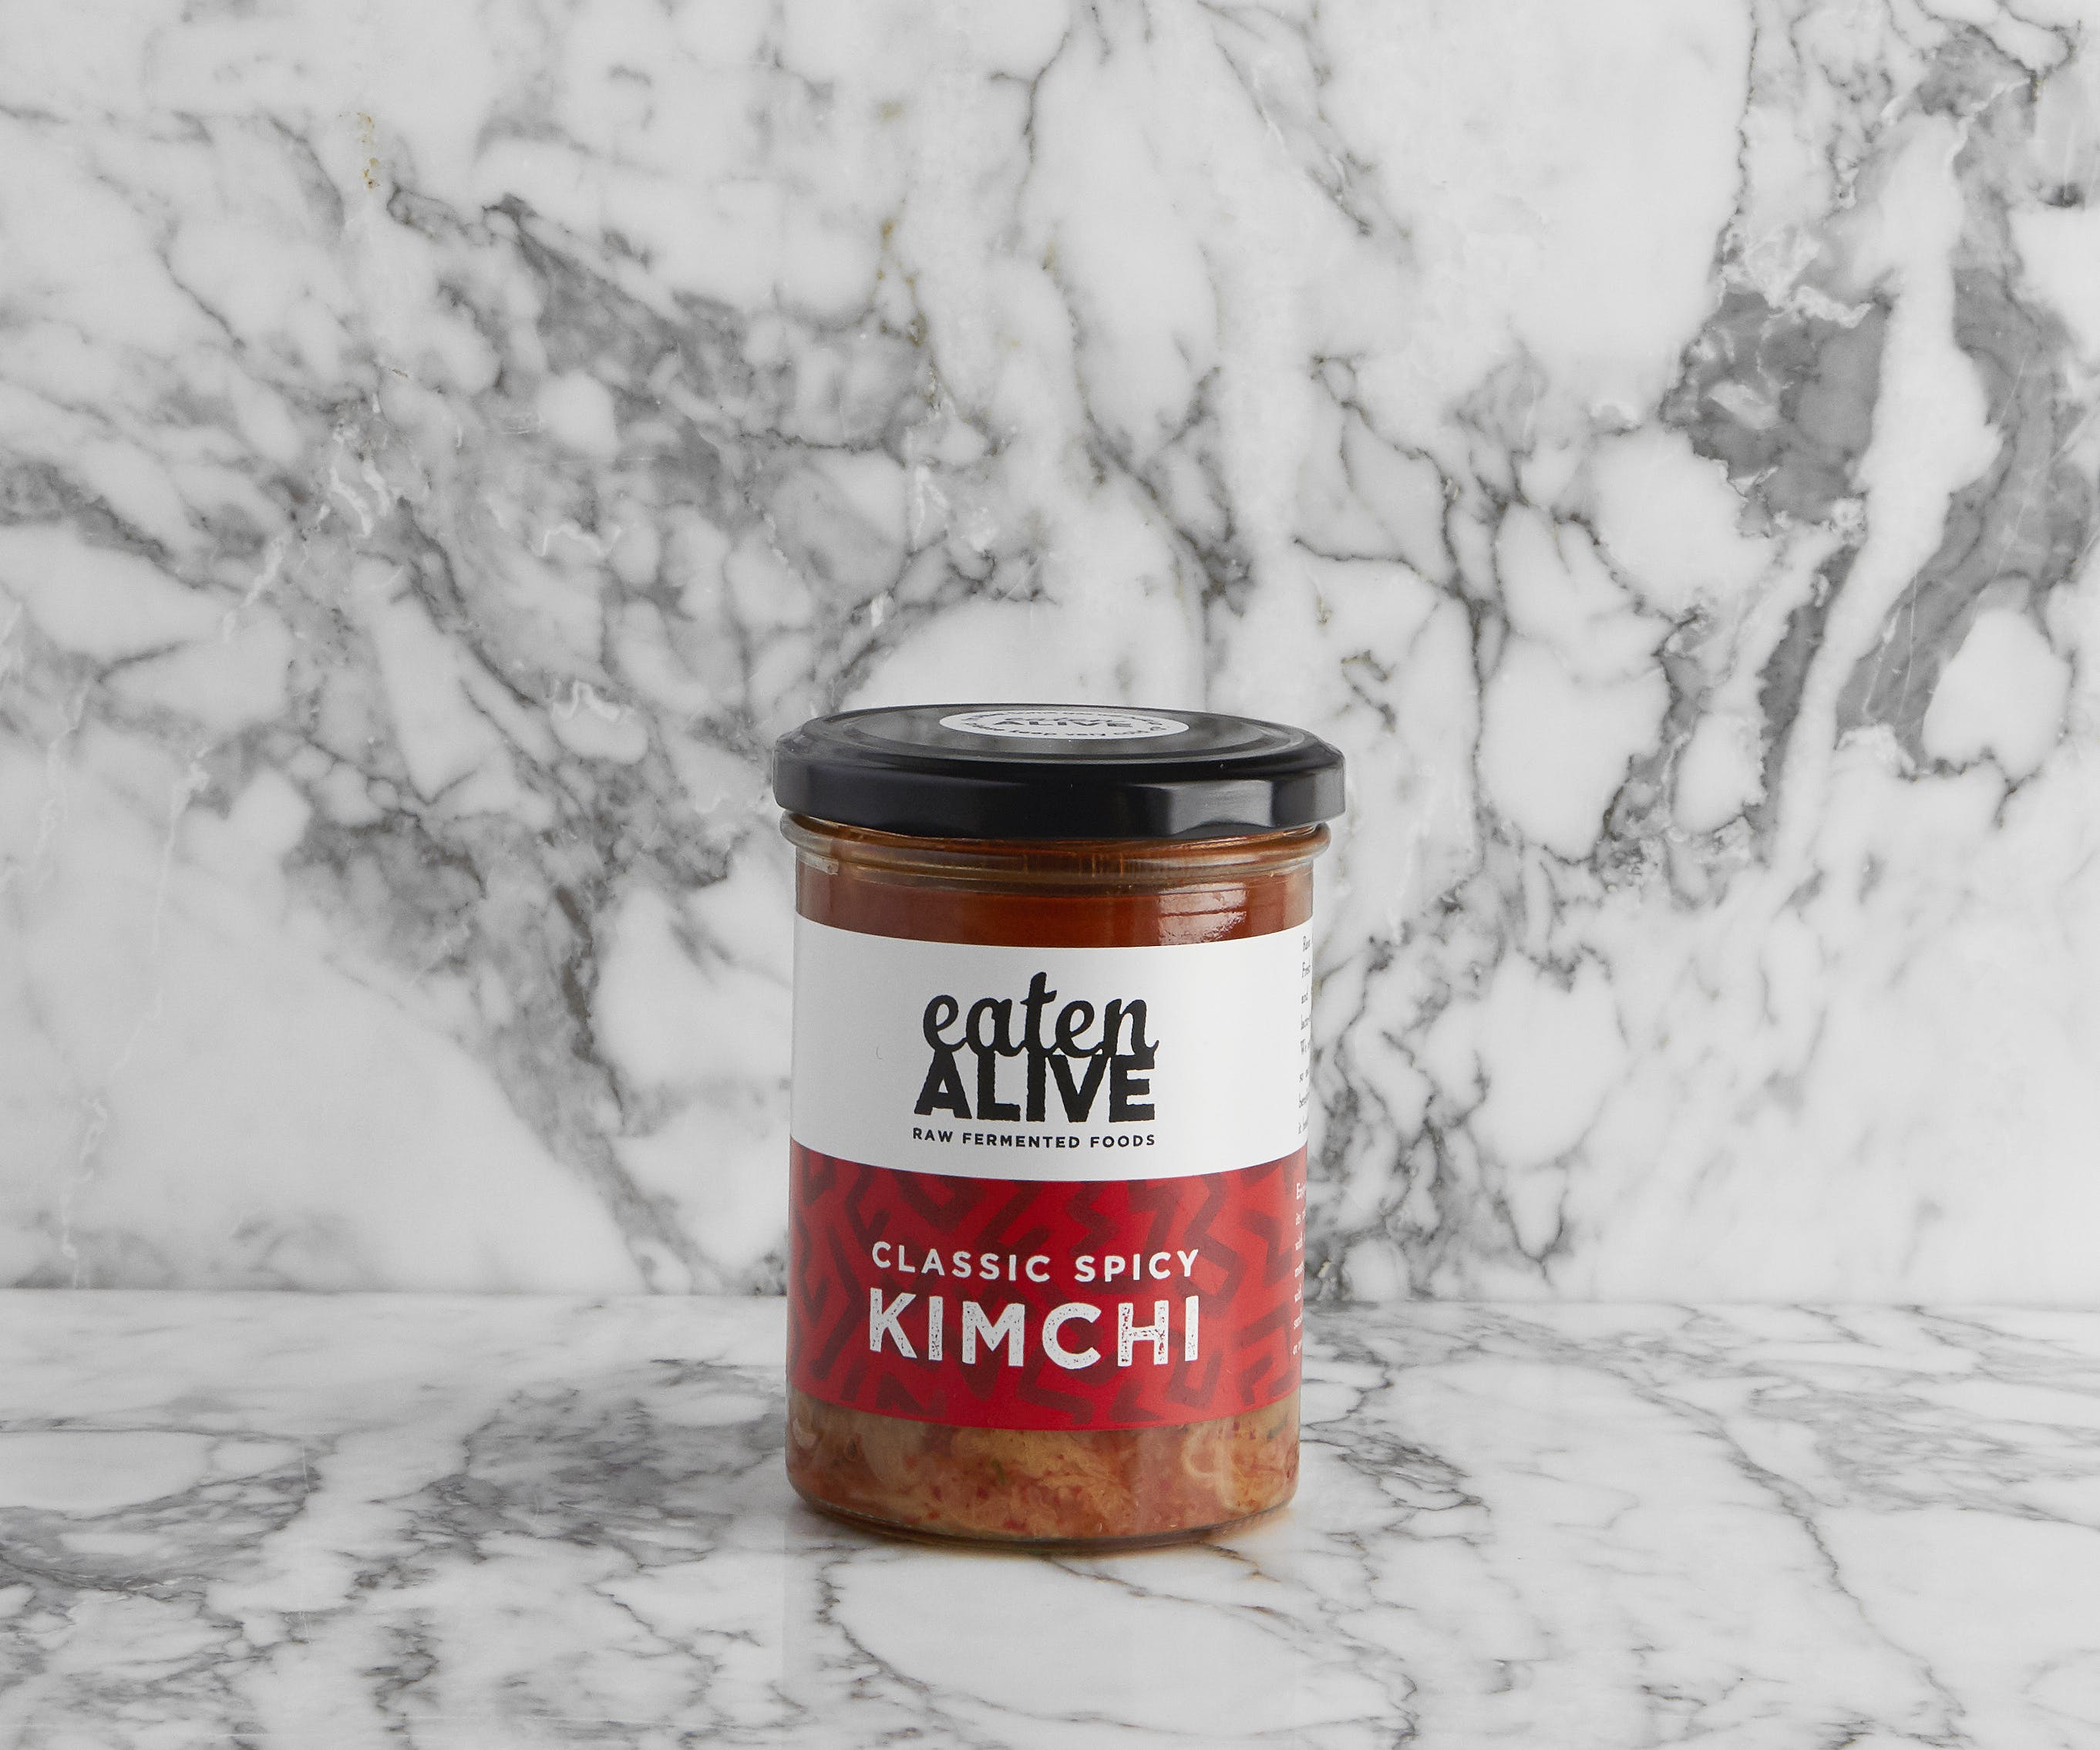 Classic Spicy Kimchi